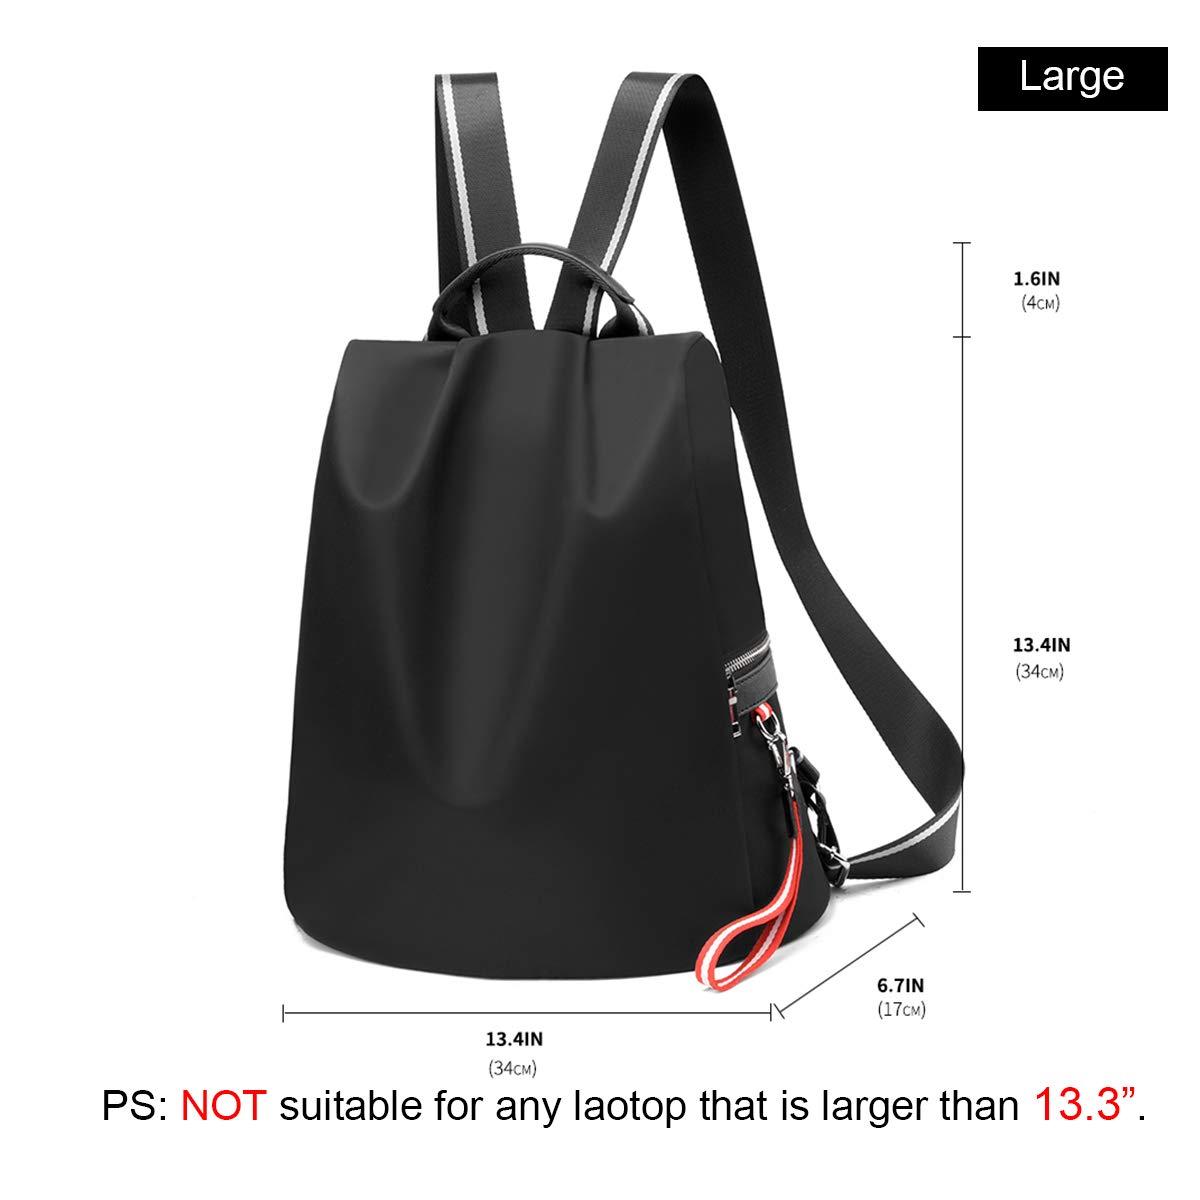 cca3c737441 Amazon.com  Backpack Purse for Women Waterproof Nylon Anti-theft Fashion  Lightweight School Travel Shoulder Bag(Black)  Shoes